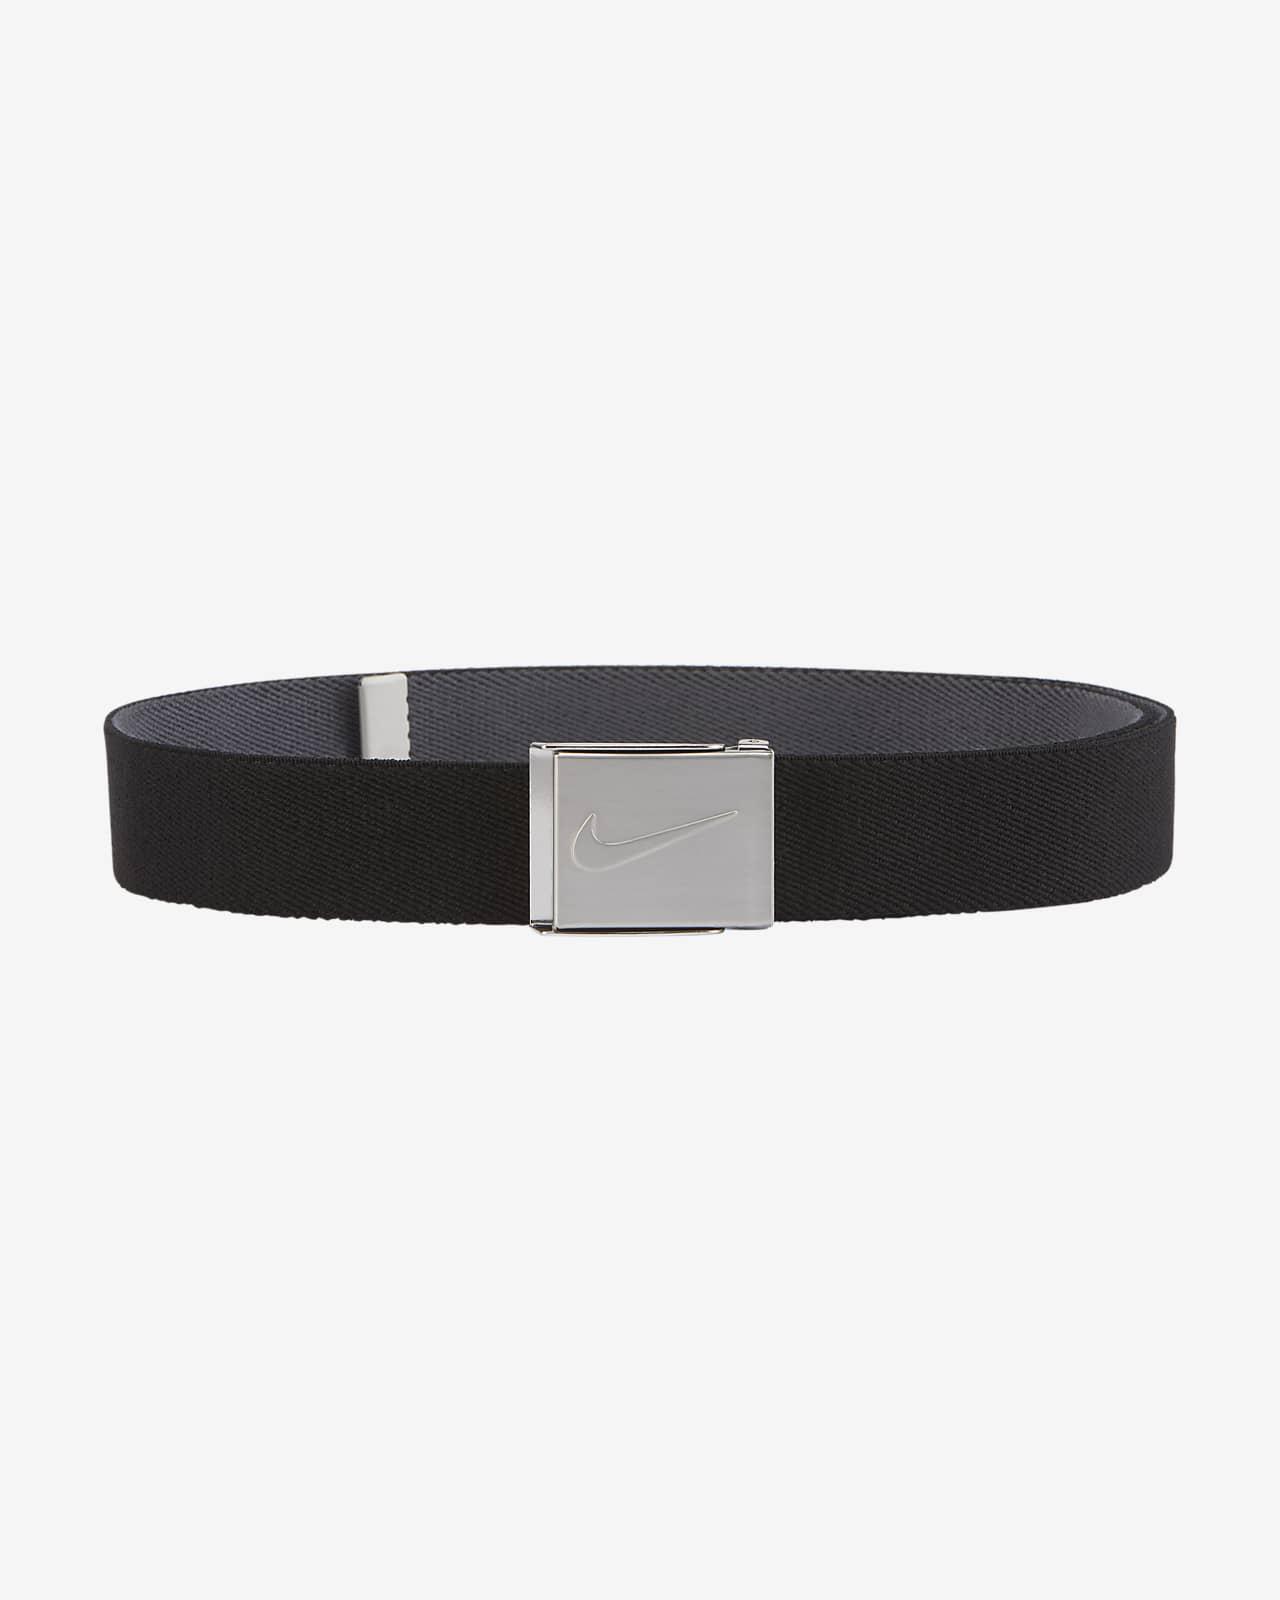 Nike Men's Reversible Stretch Web Golf Belt